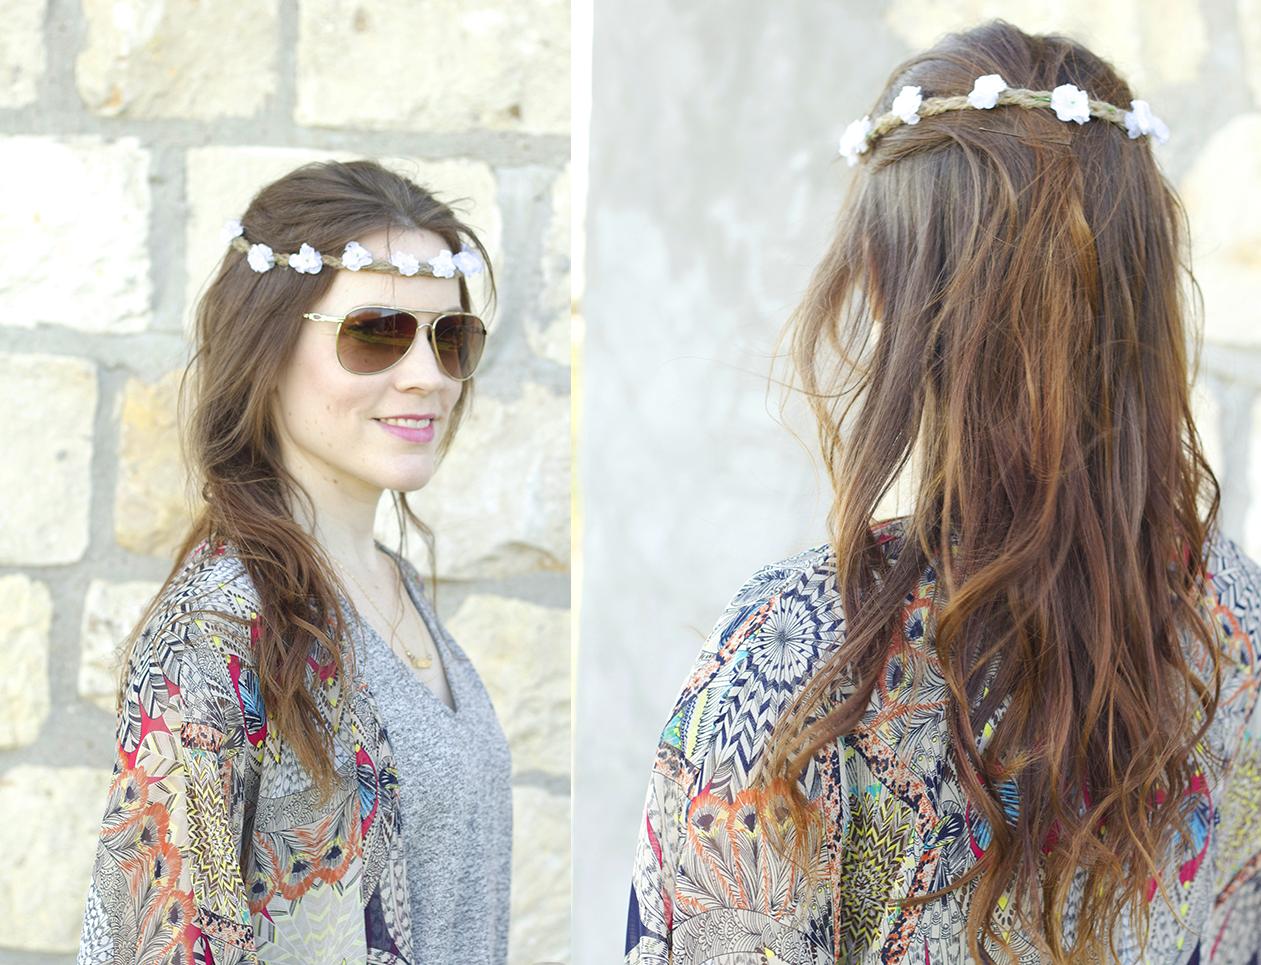 Como hacer coronas de flores ¡Tu cabello de encanto aun en verano!1